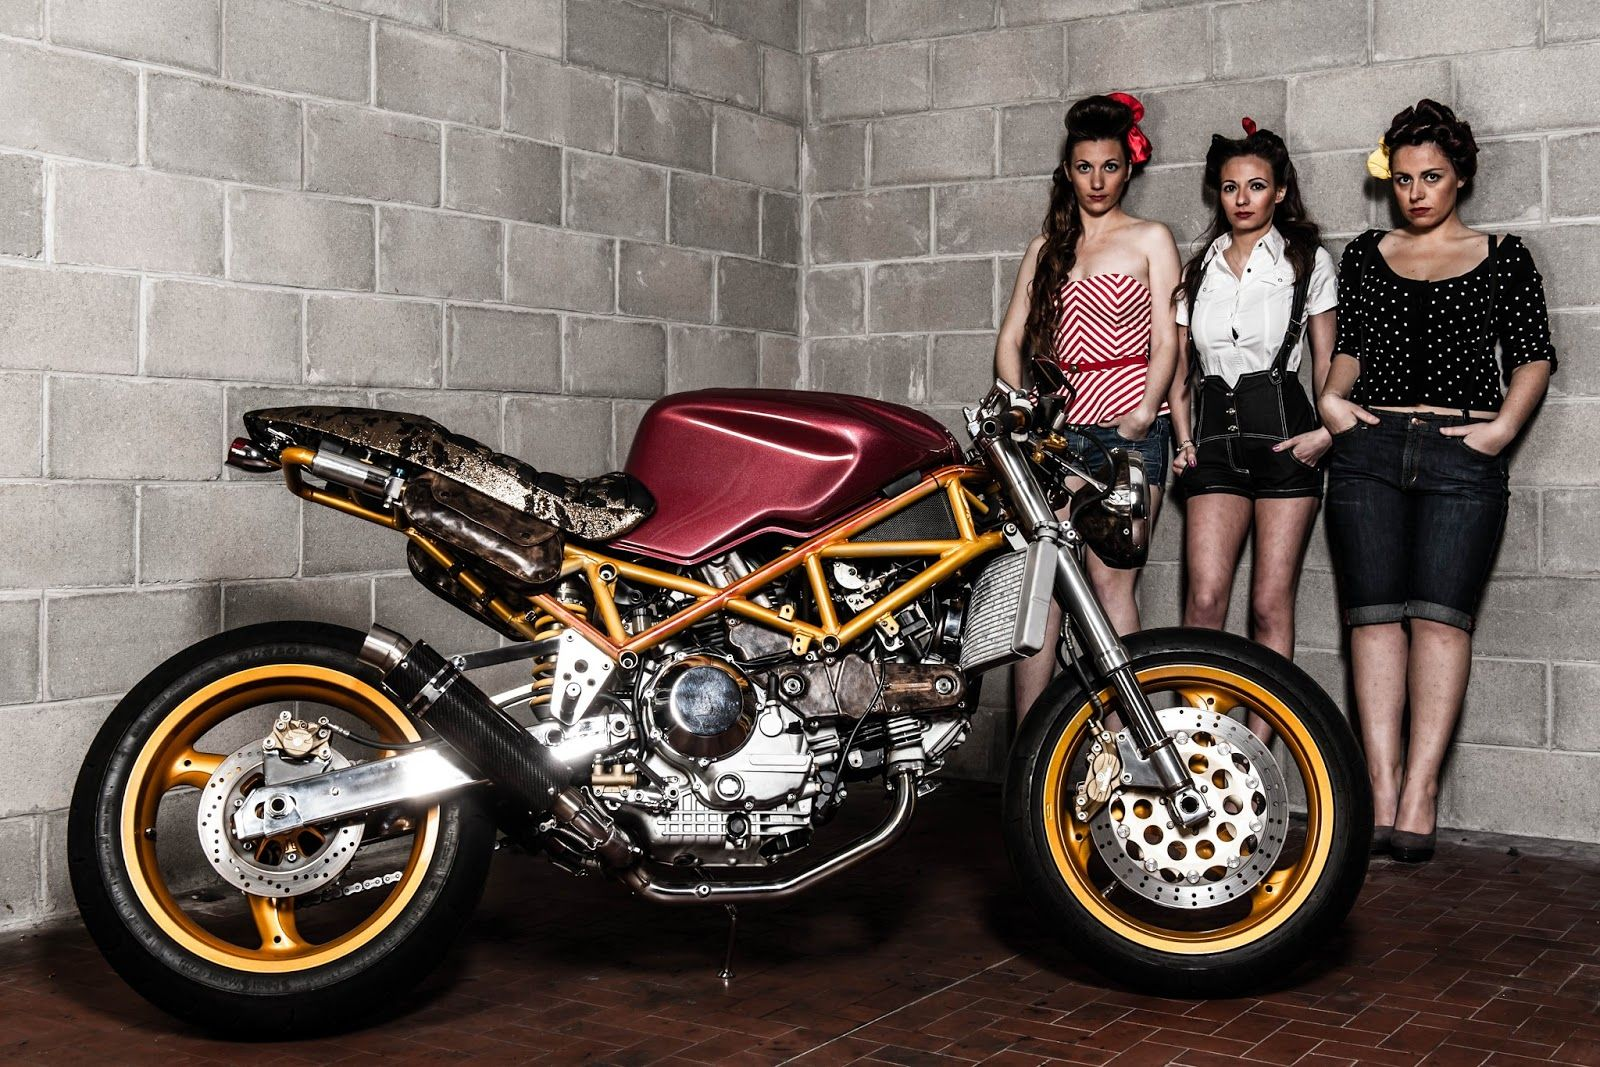 lady motorcycle racers | ducati cafe racer motorcycles | motorrad